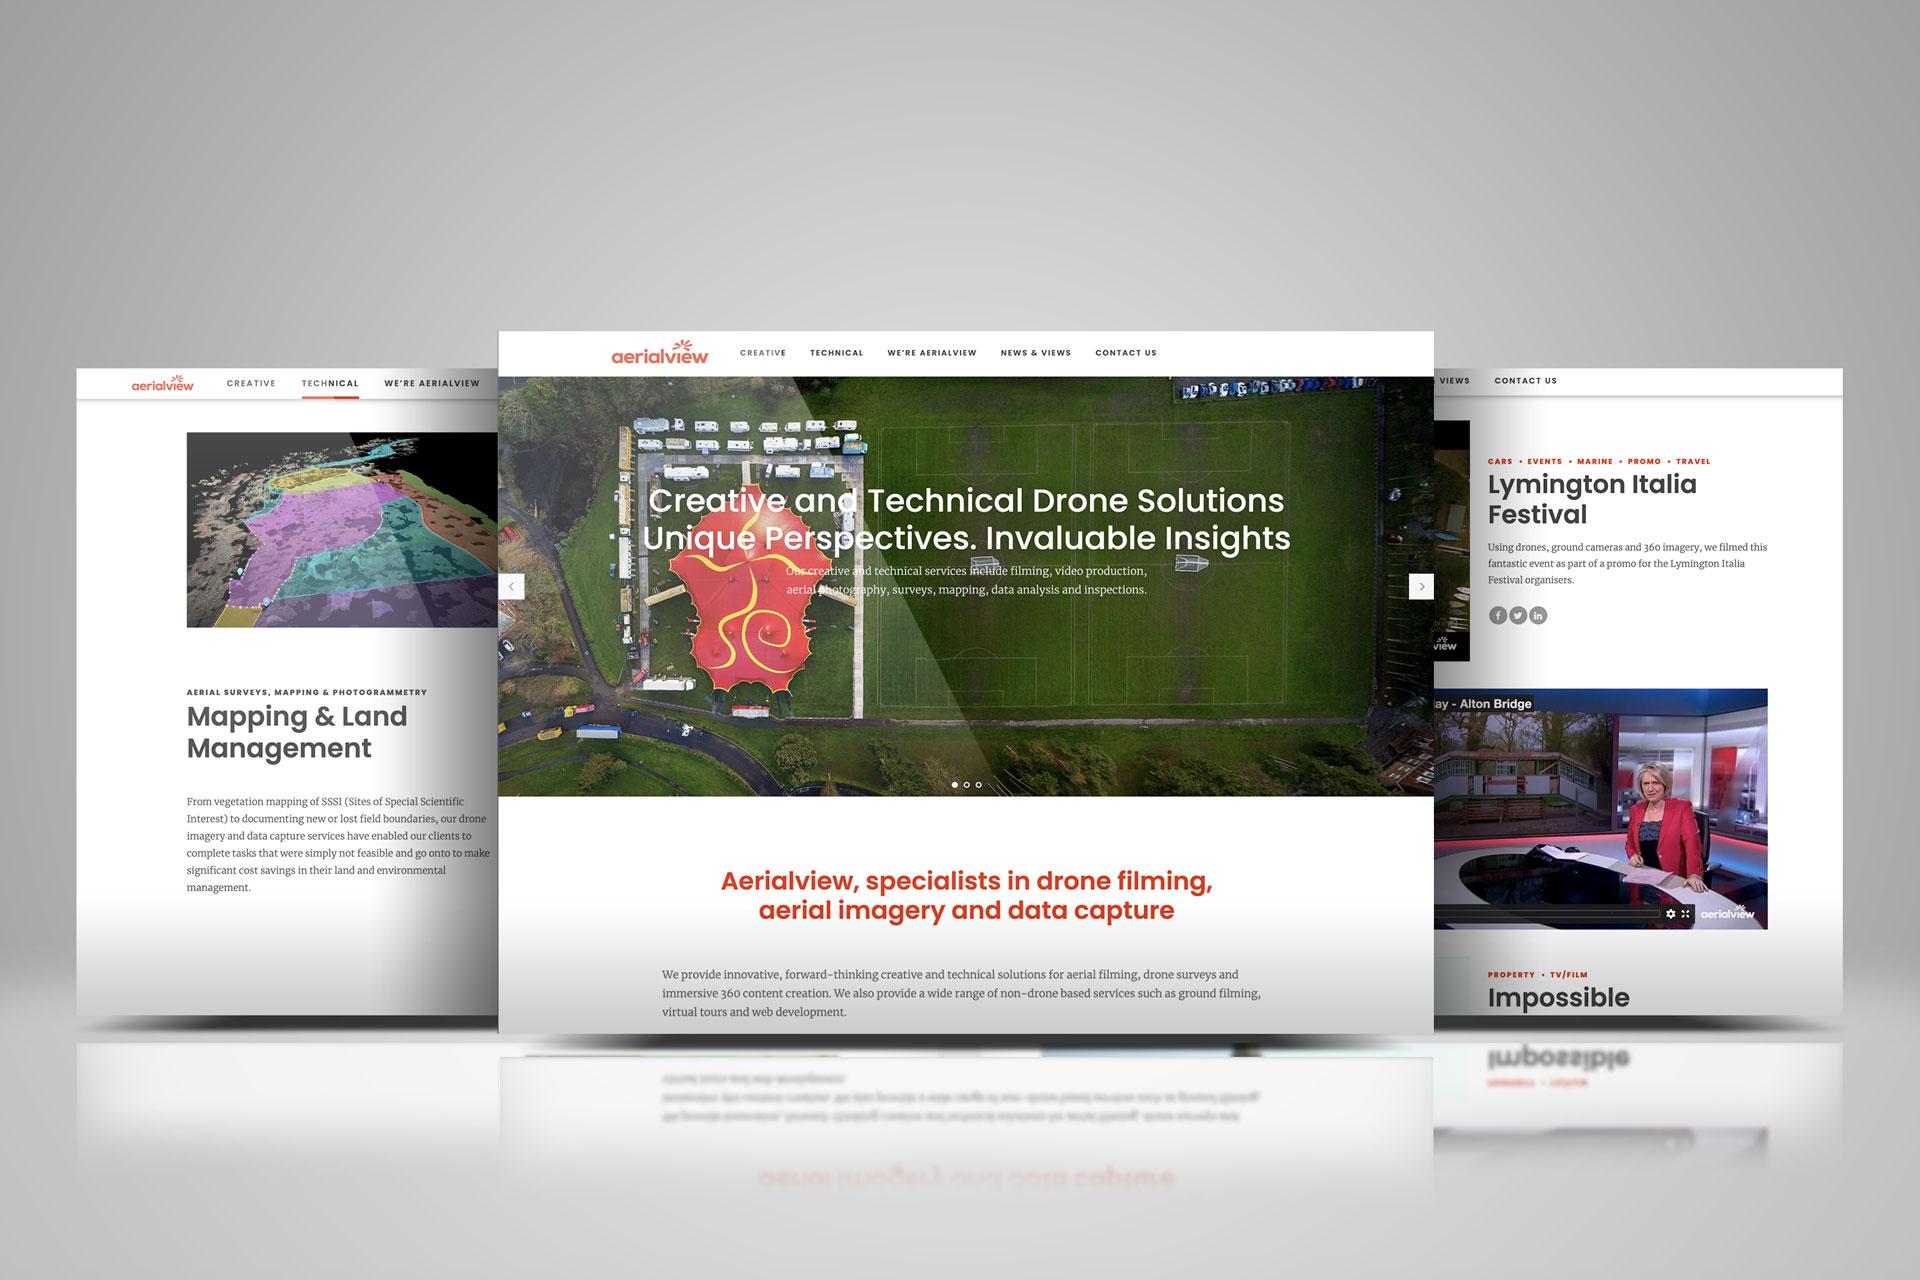 New Aerialview website images